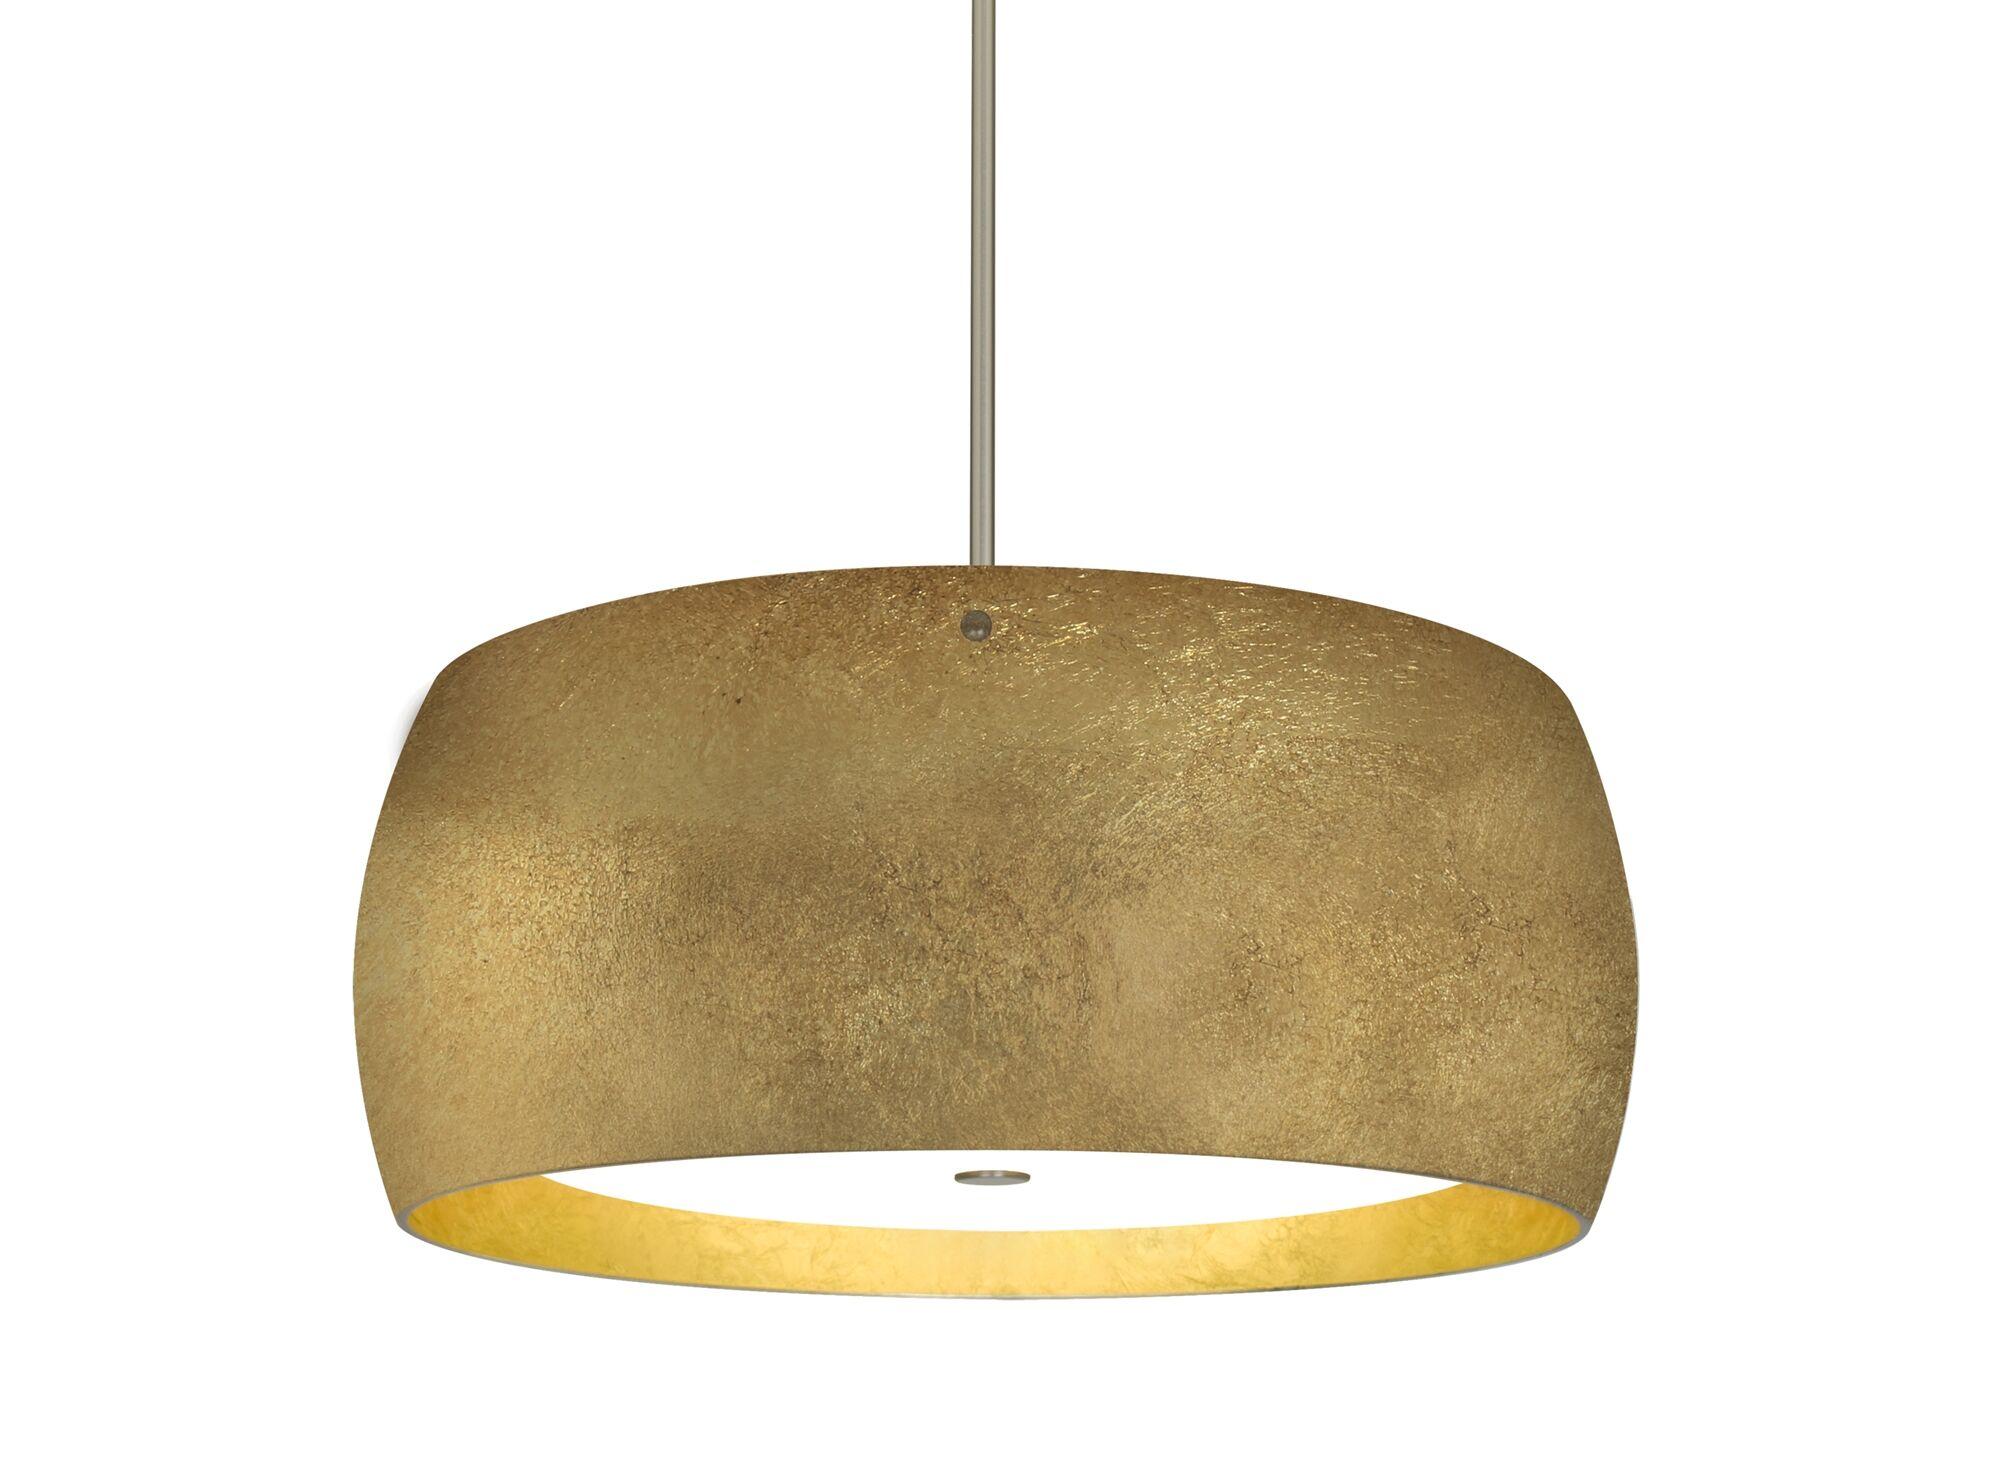 Speidel 3-Light Pendant Base Finish: Satin Nickel, Shade Color: Gold